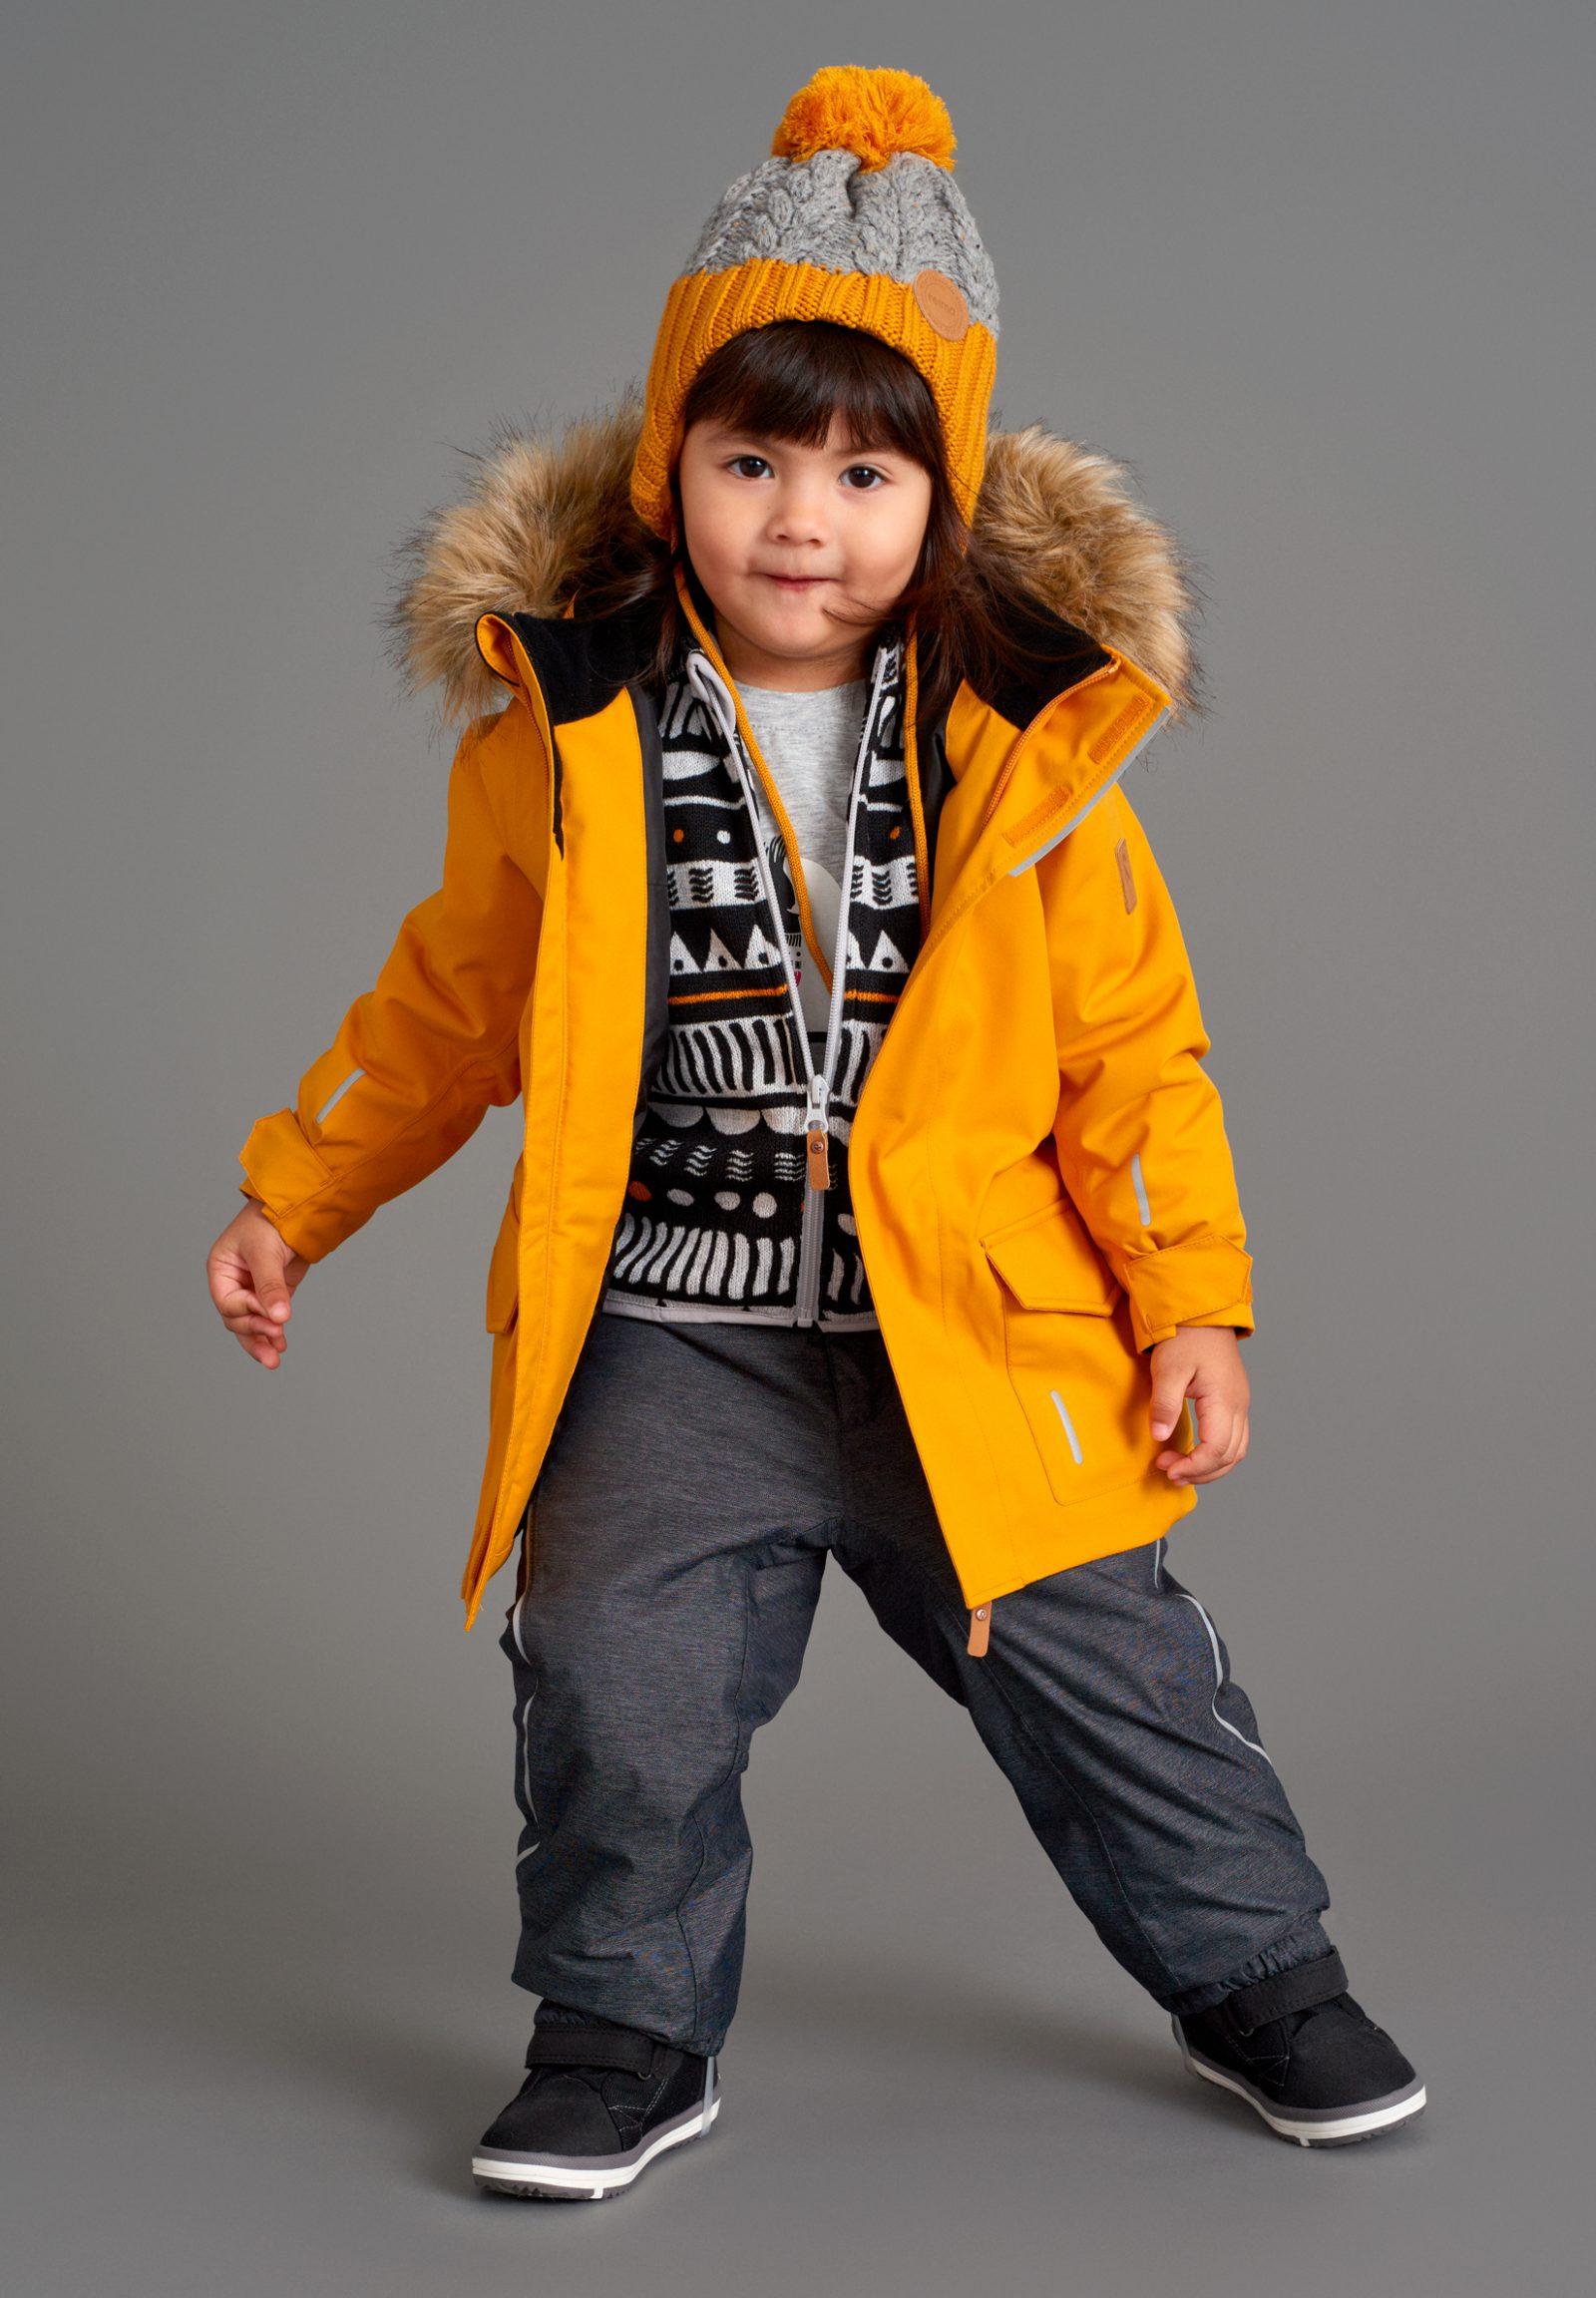 Reima detska bunda Myre, detská zimná čiapka Nahanni, detský sveter Ornament